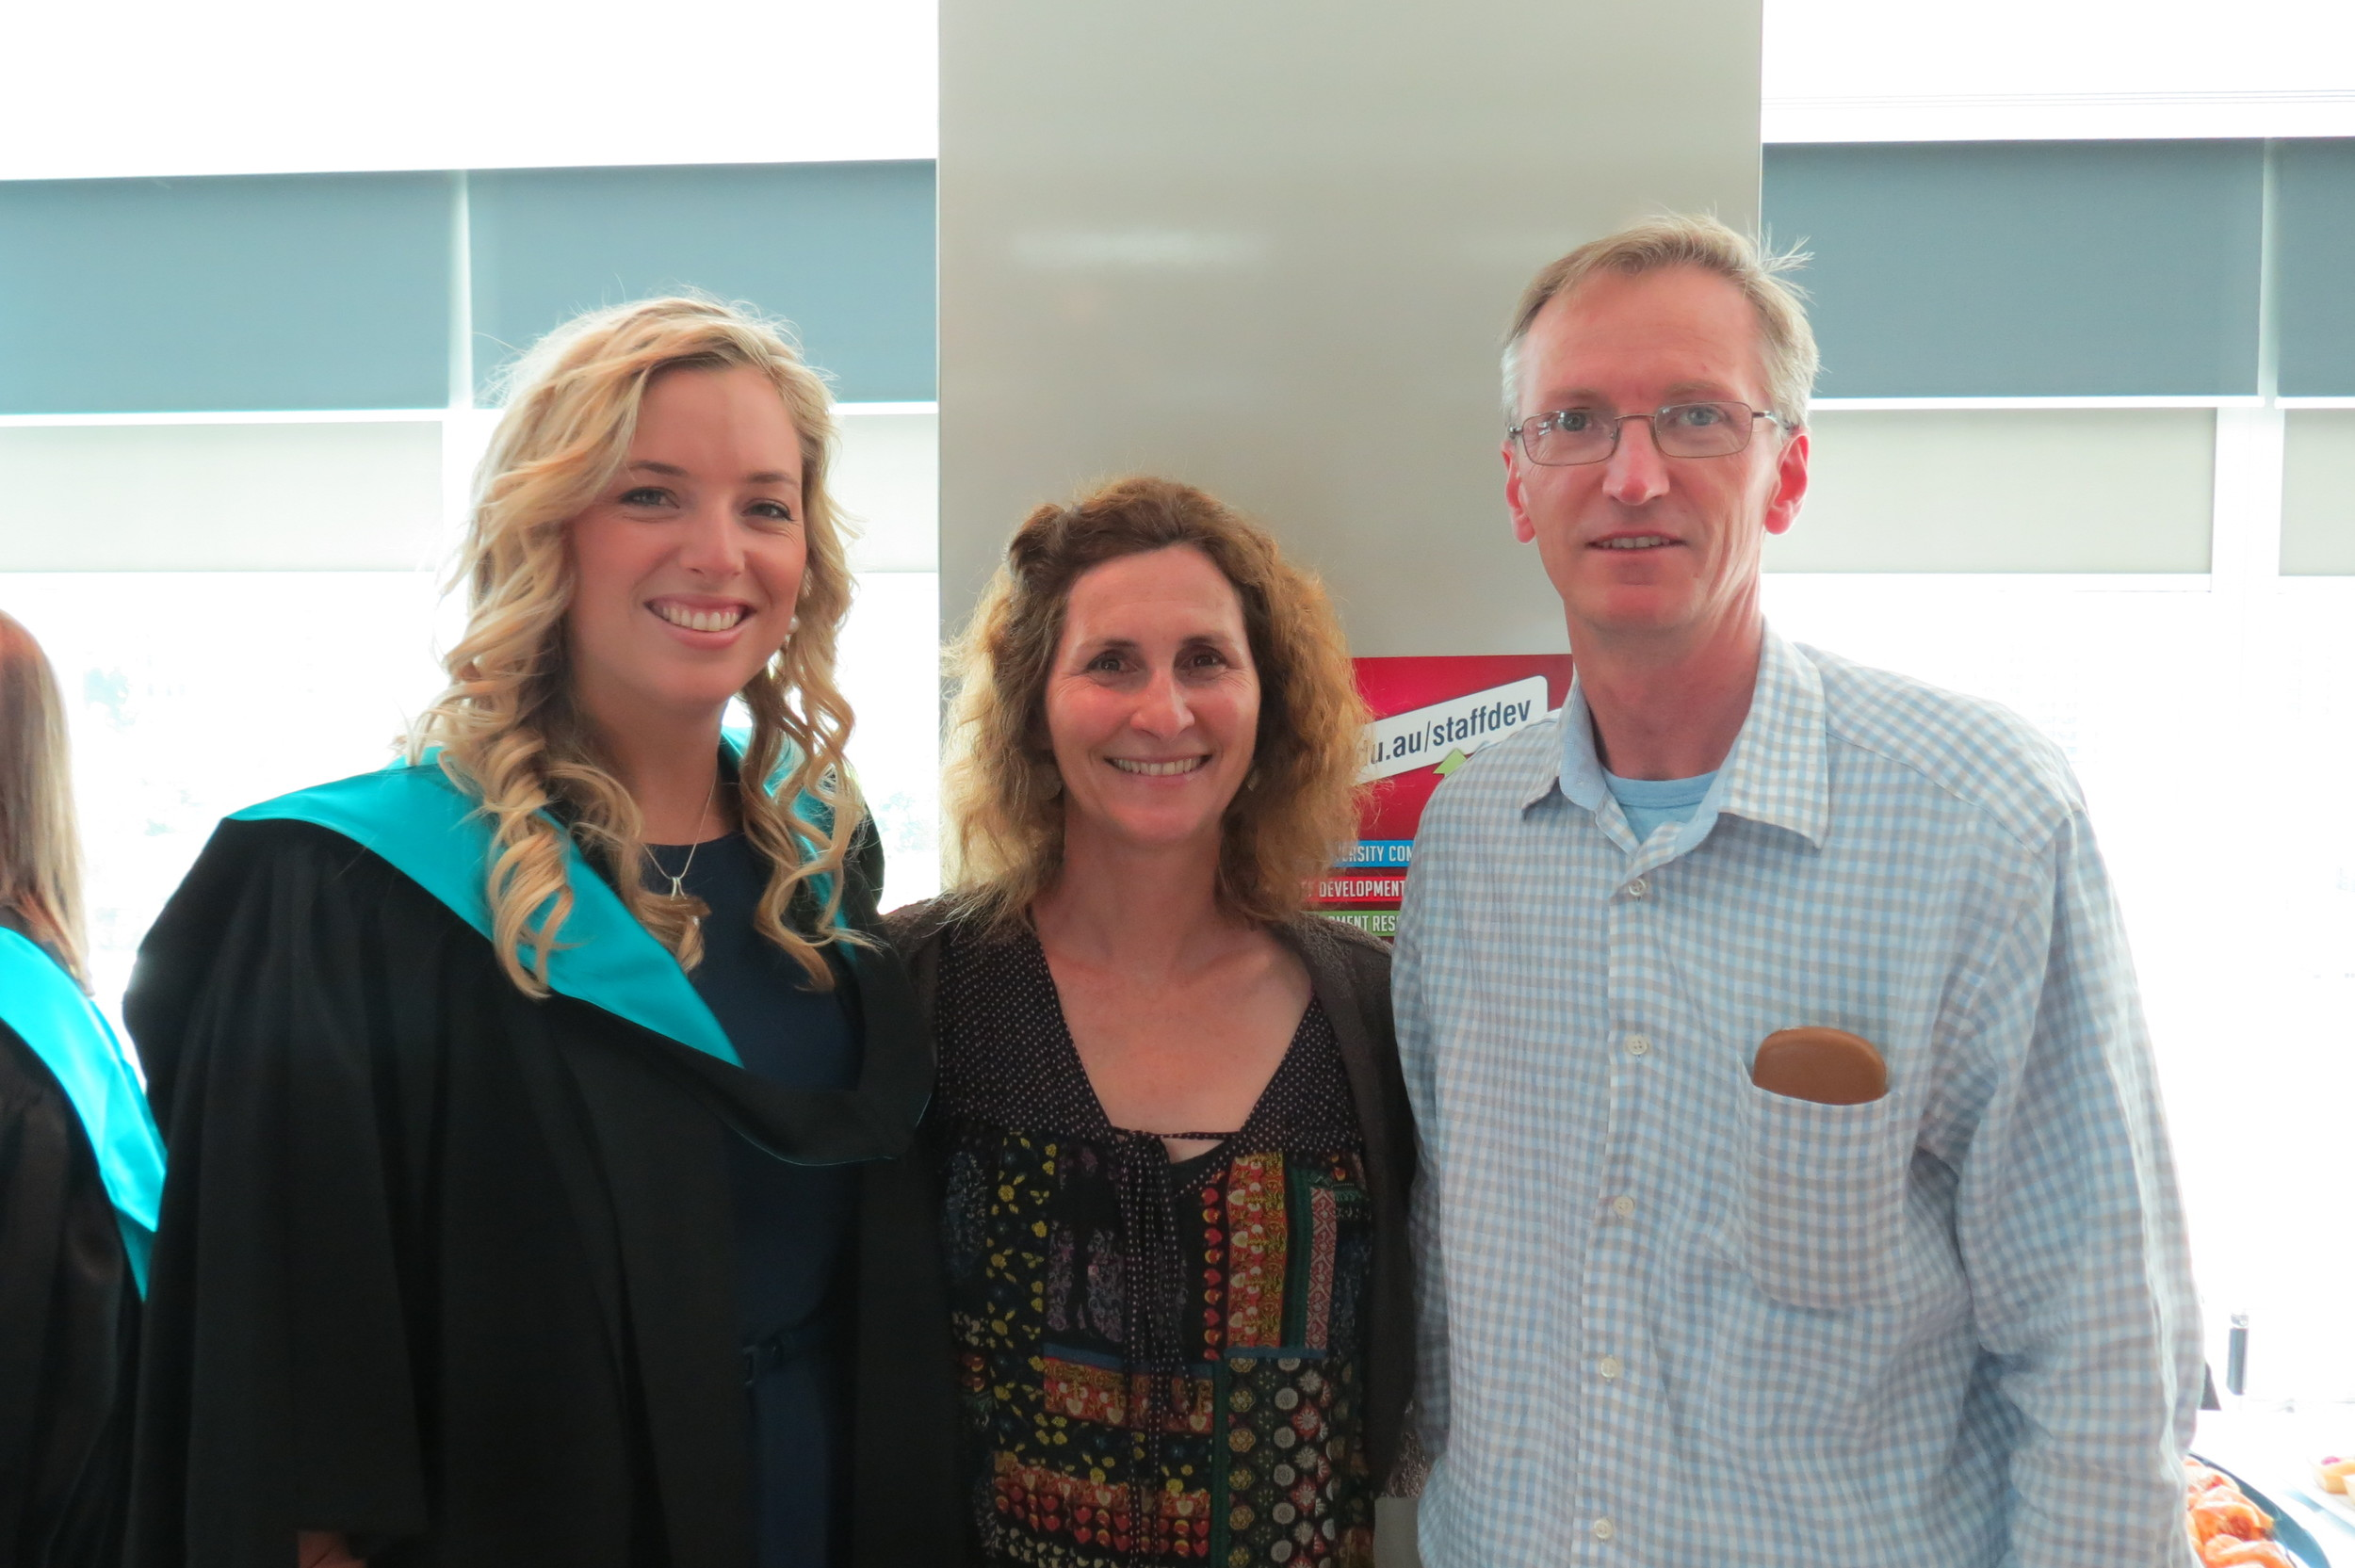 Christine and David at graduation 2013